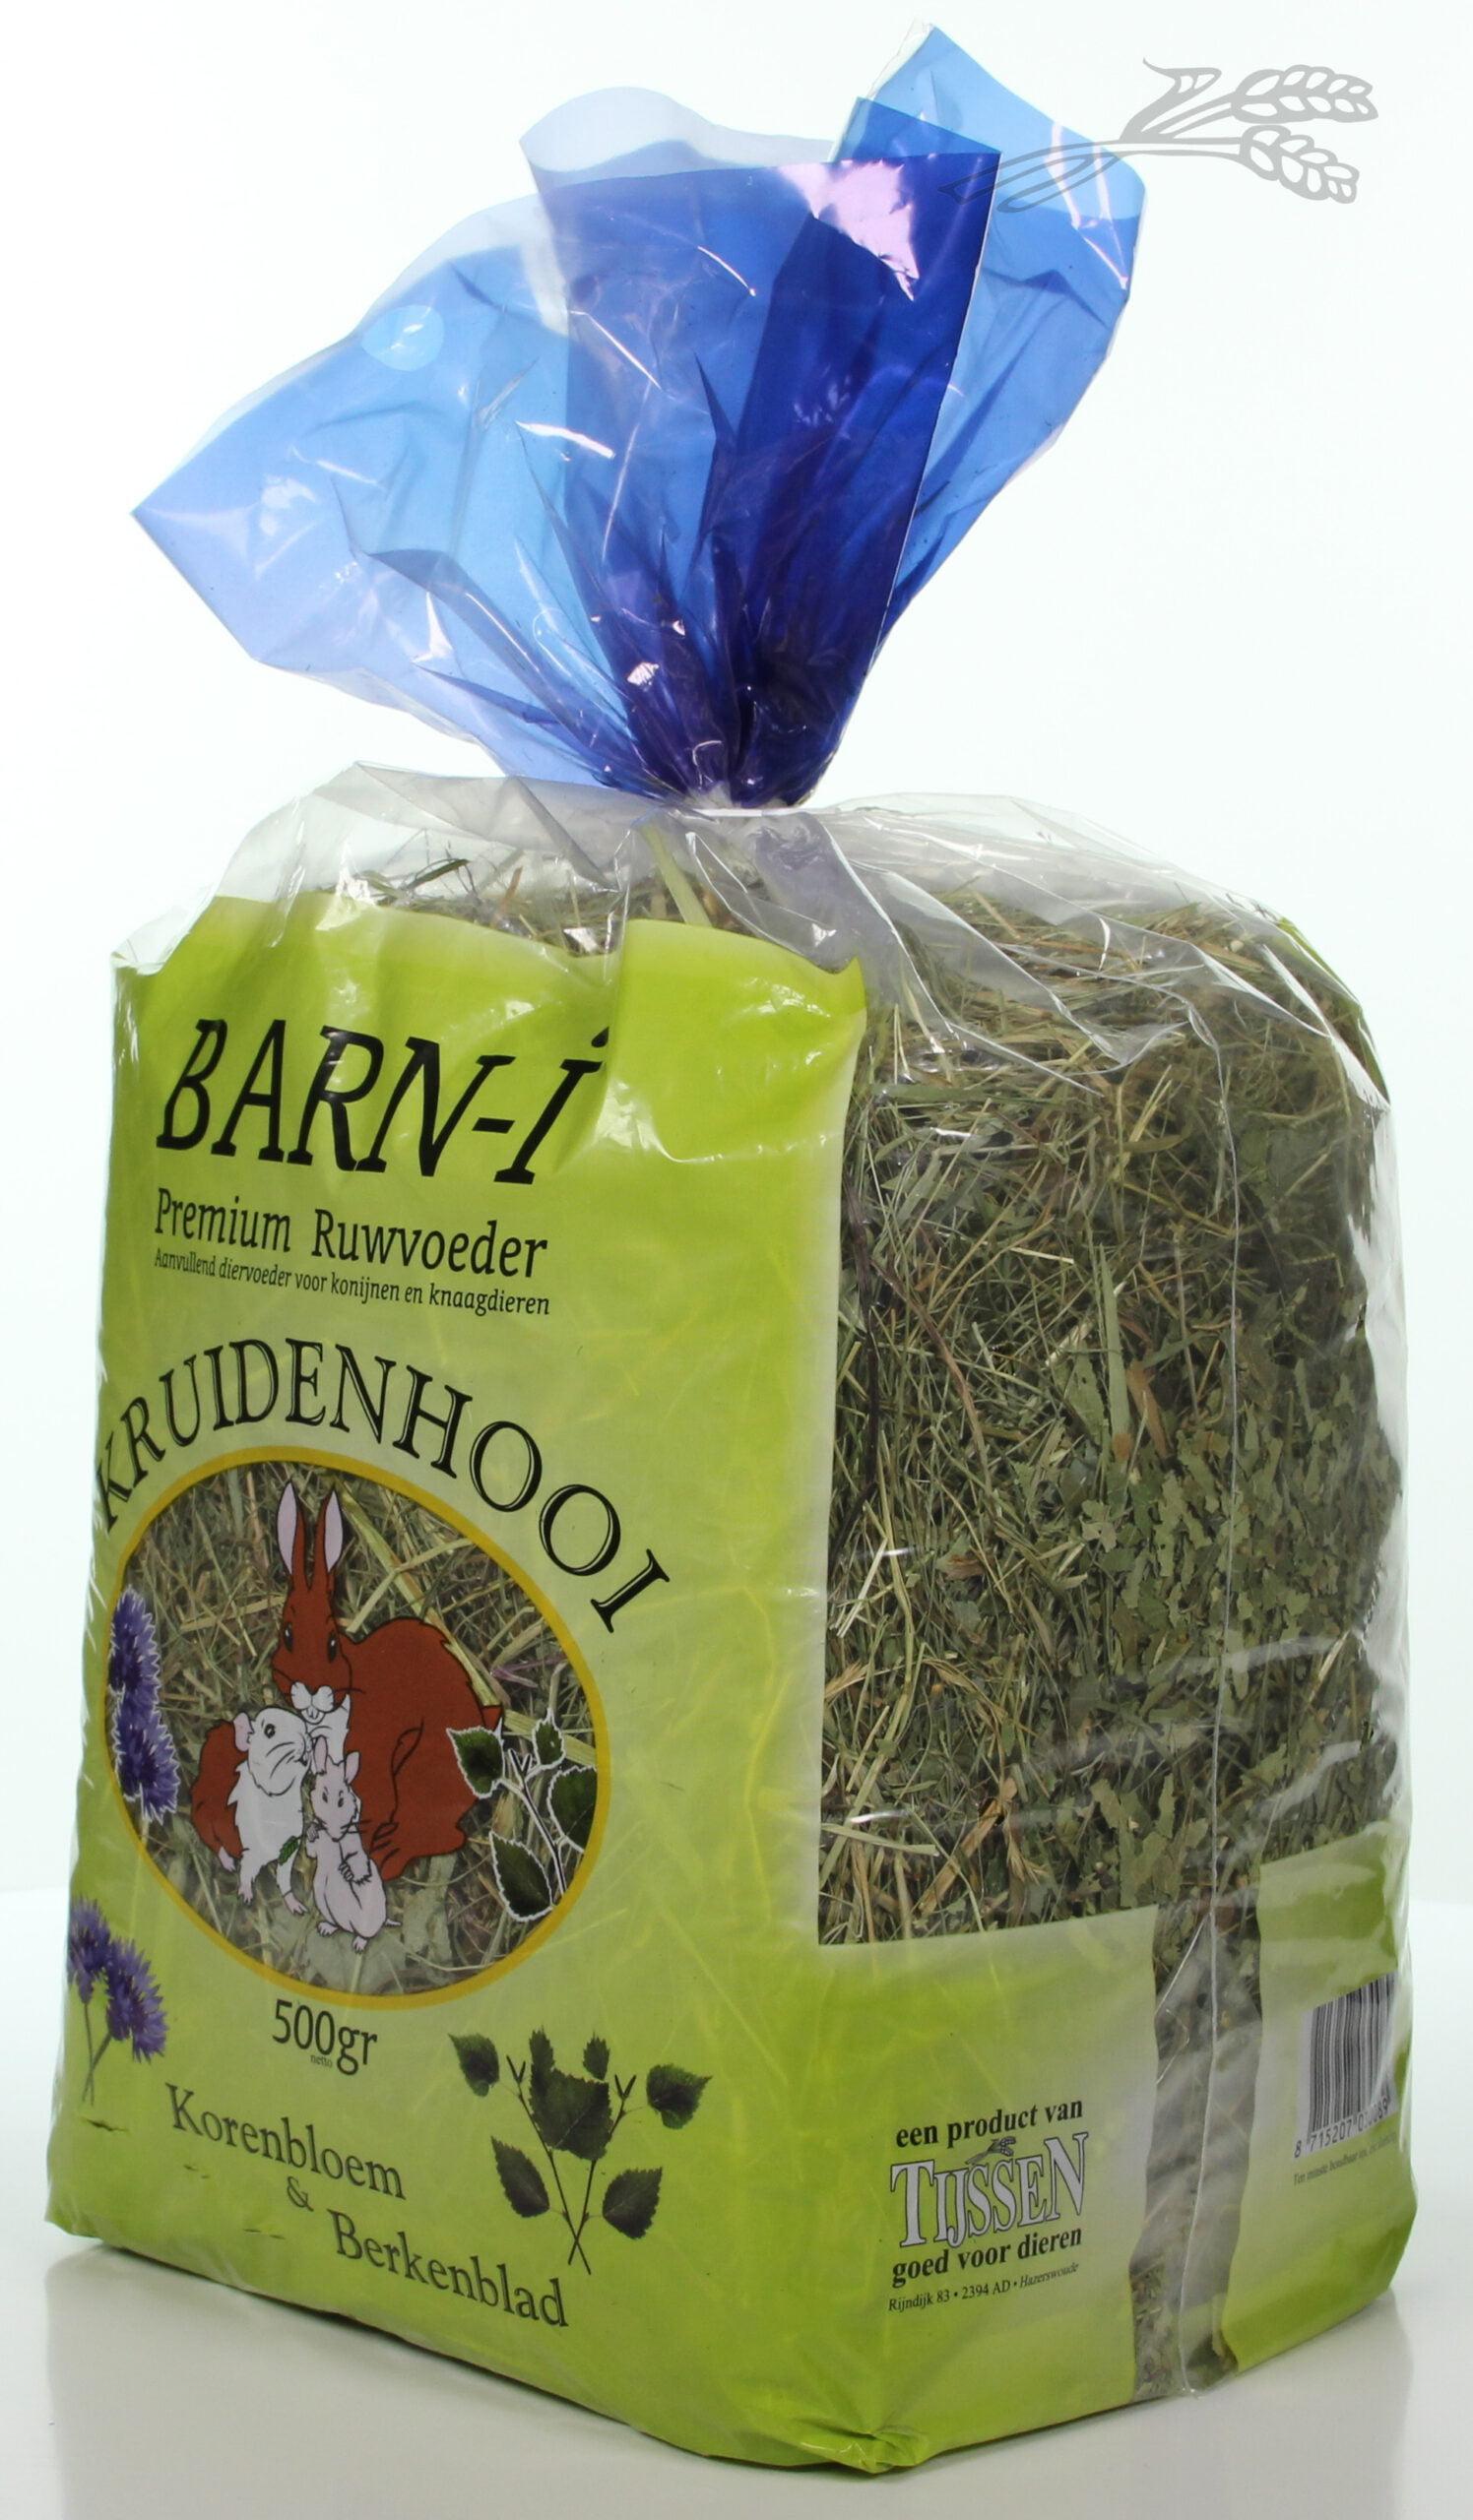 Barn-i Kruidenhooi Korenbloem en berkenblad 500gr